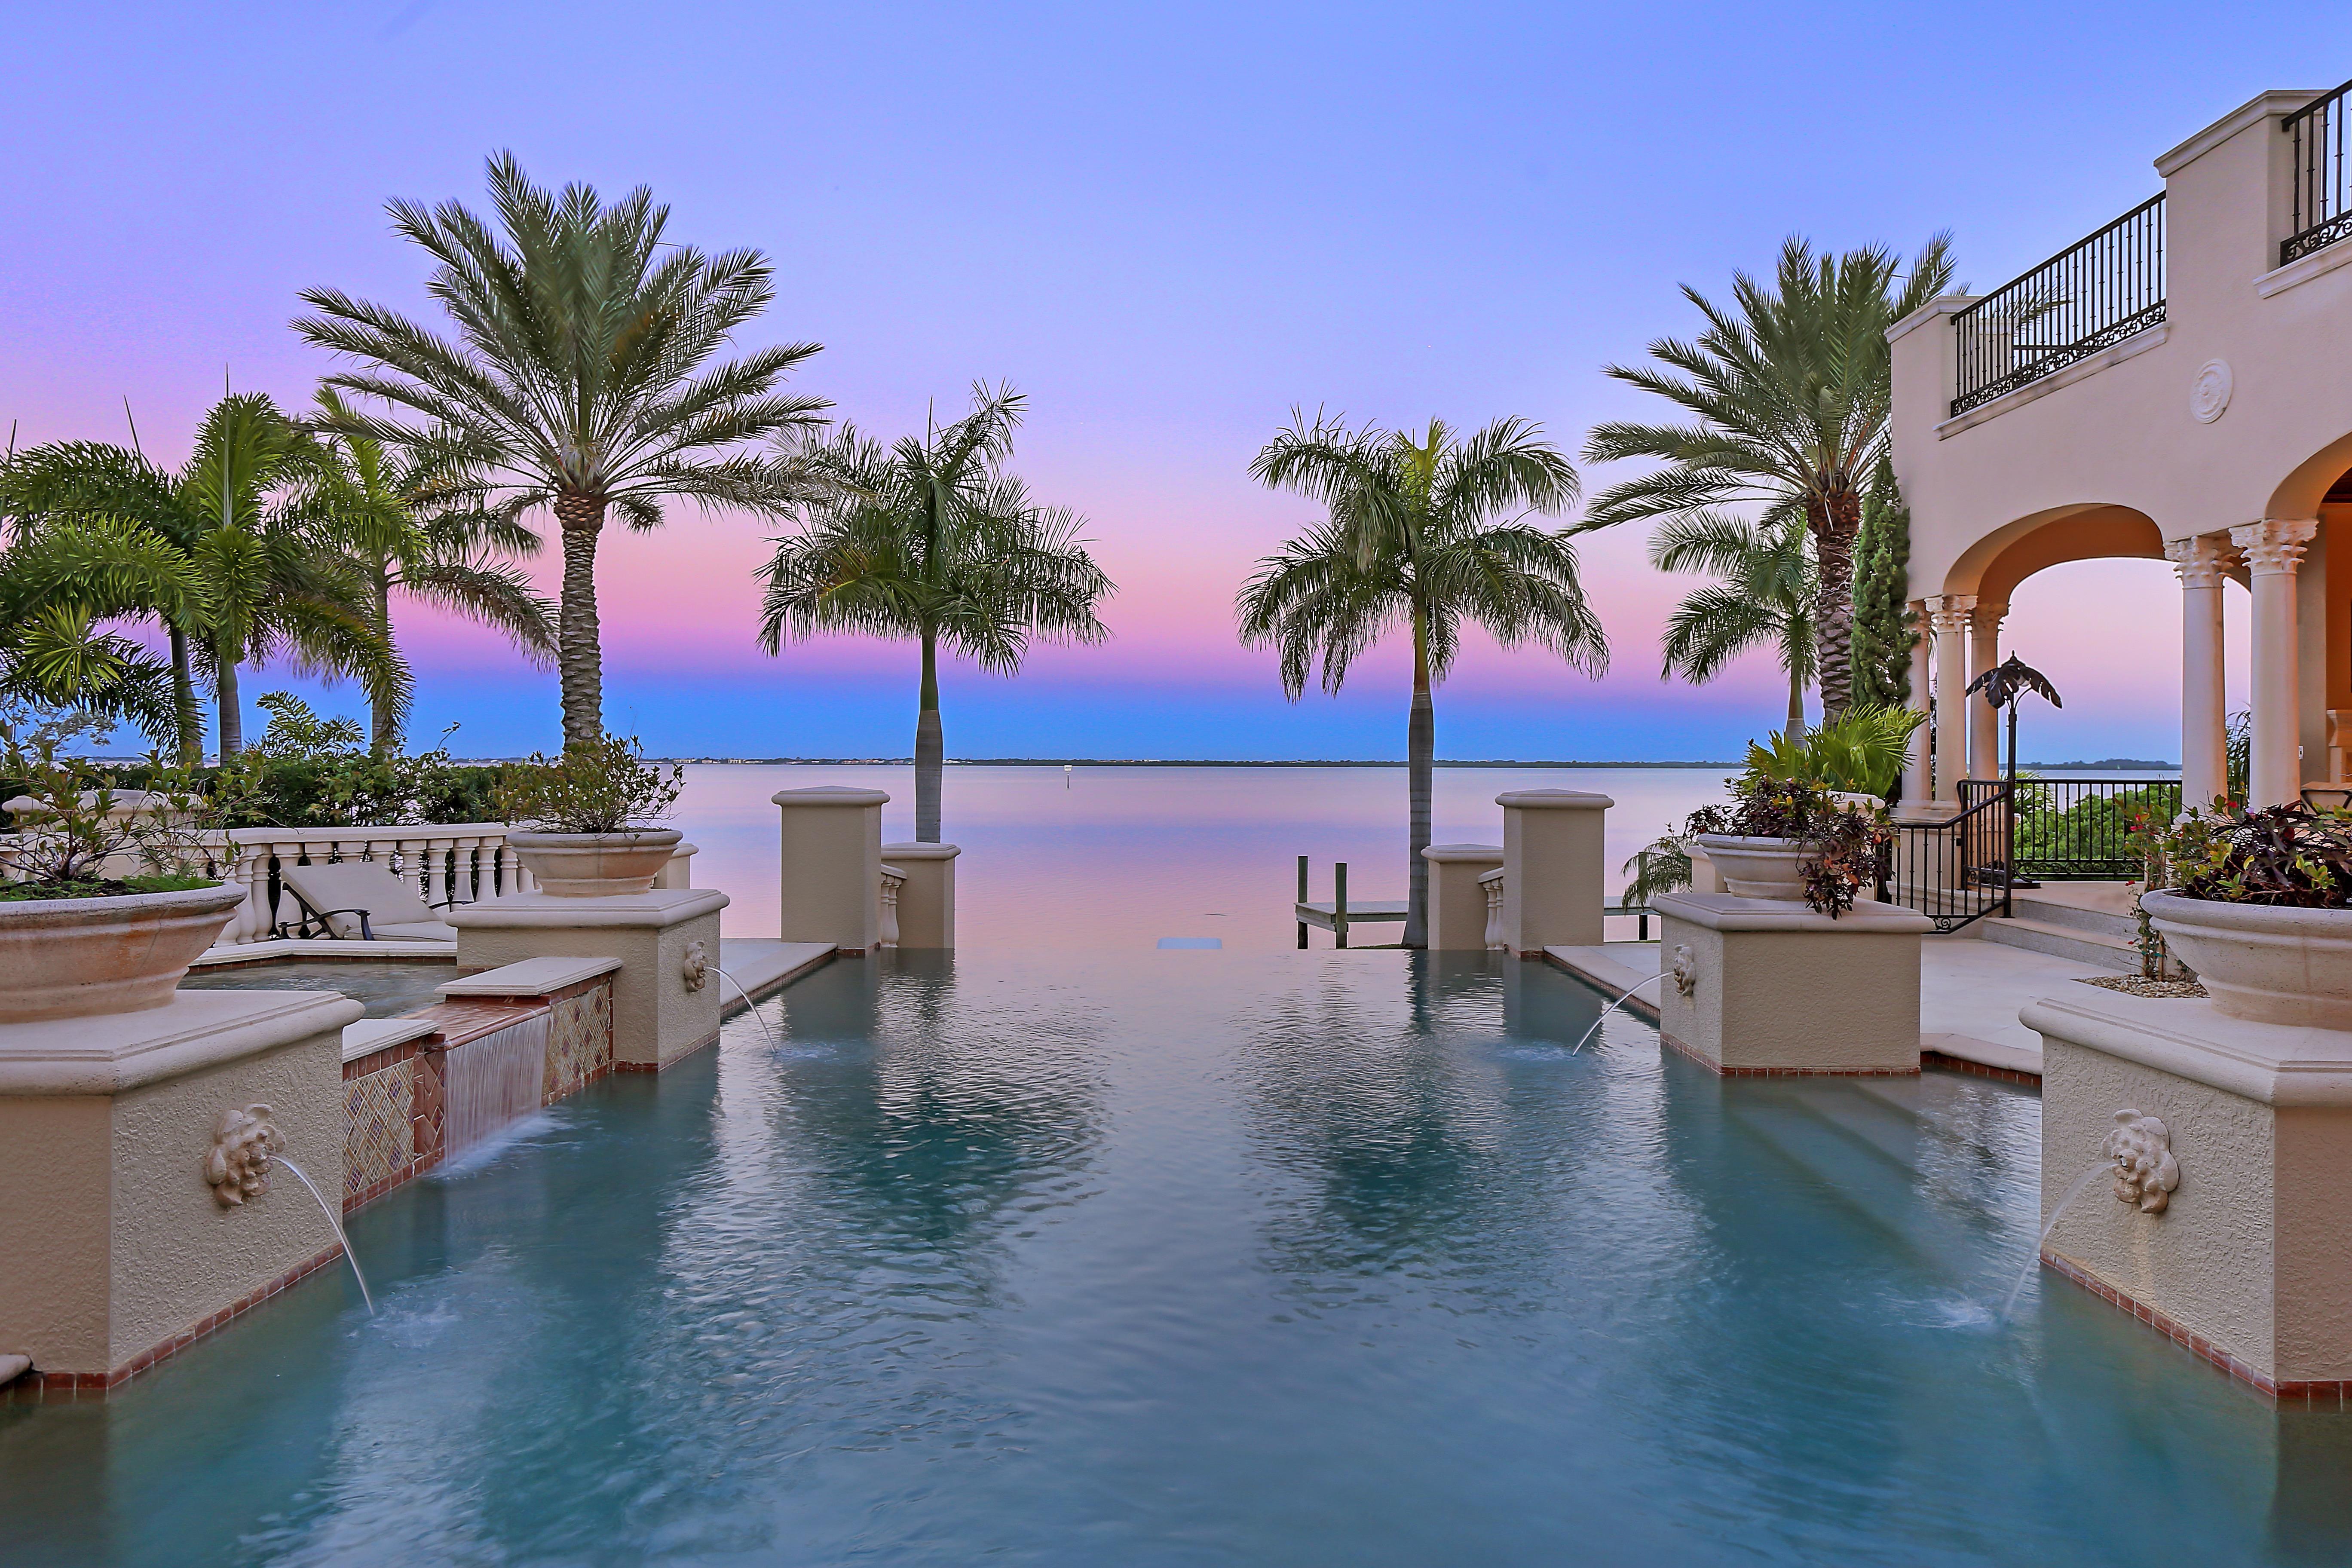 Mediterranean Style Infinity Pool (Image 7 of 20)